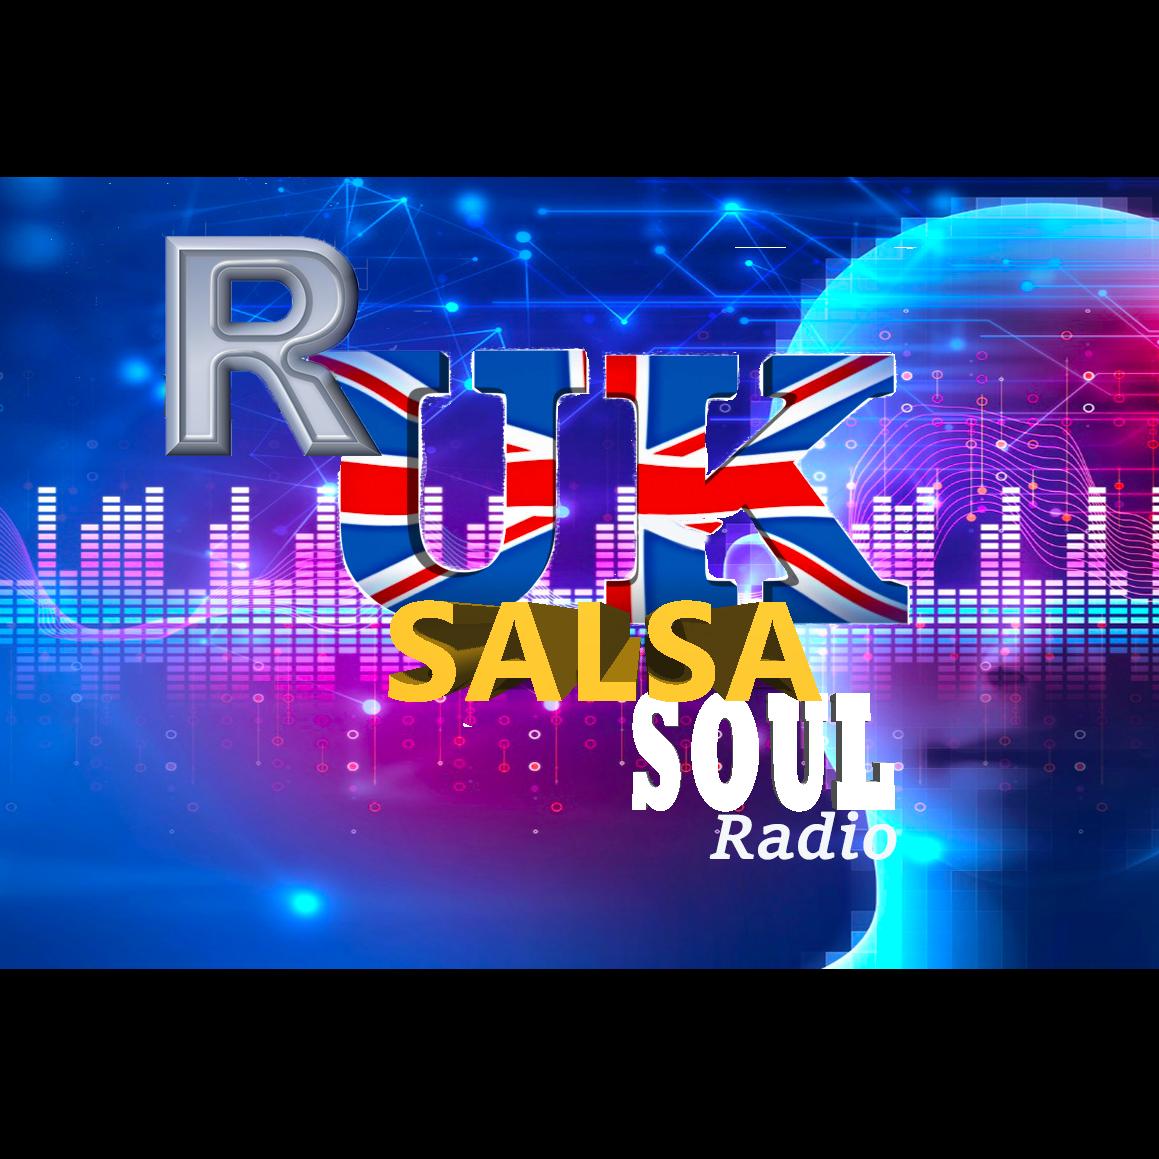 RUK SALSASOUL RADIO